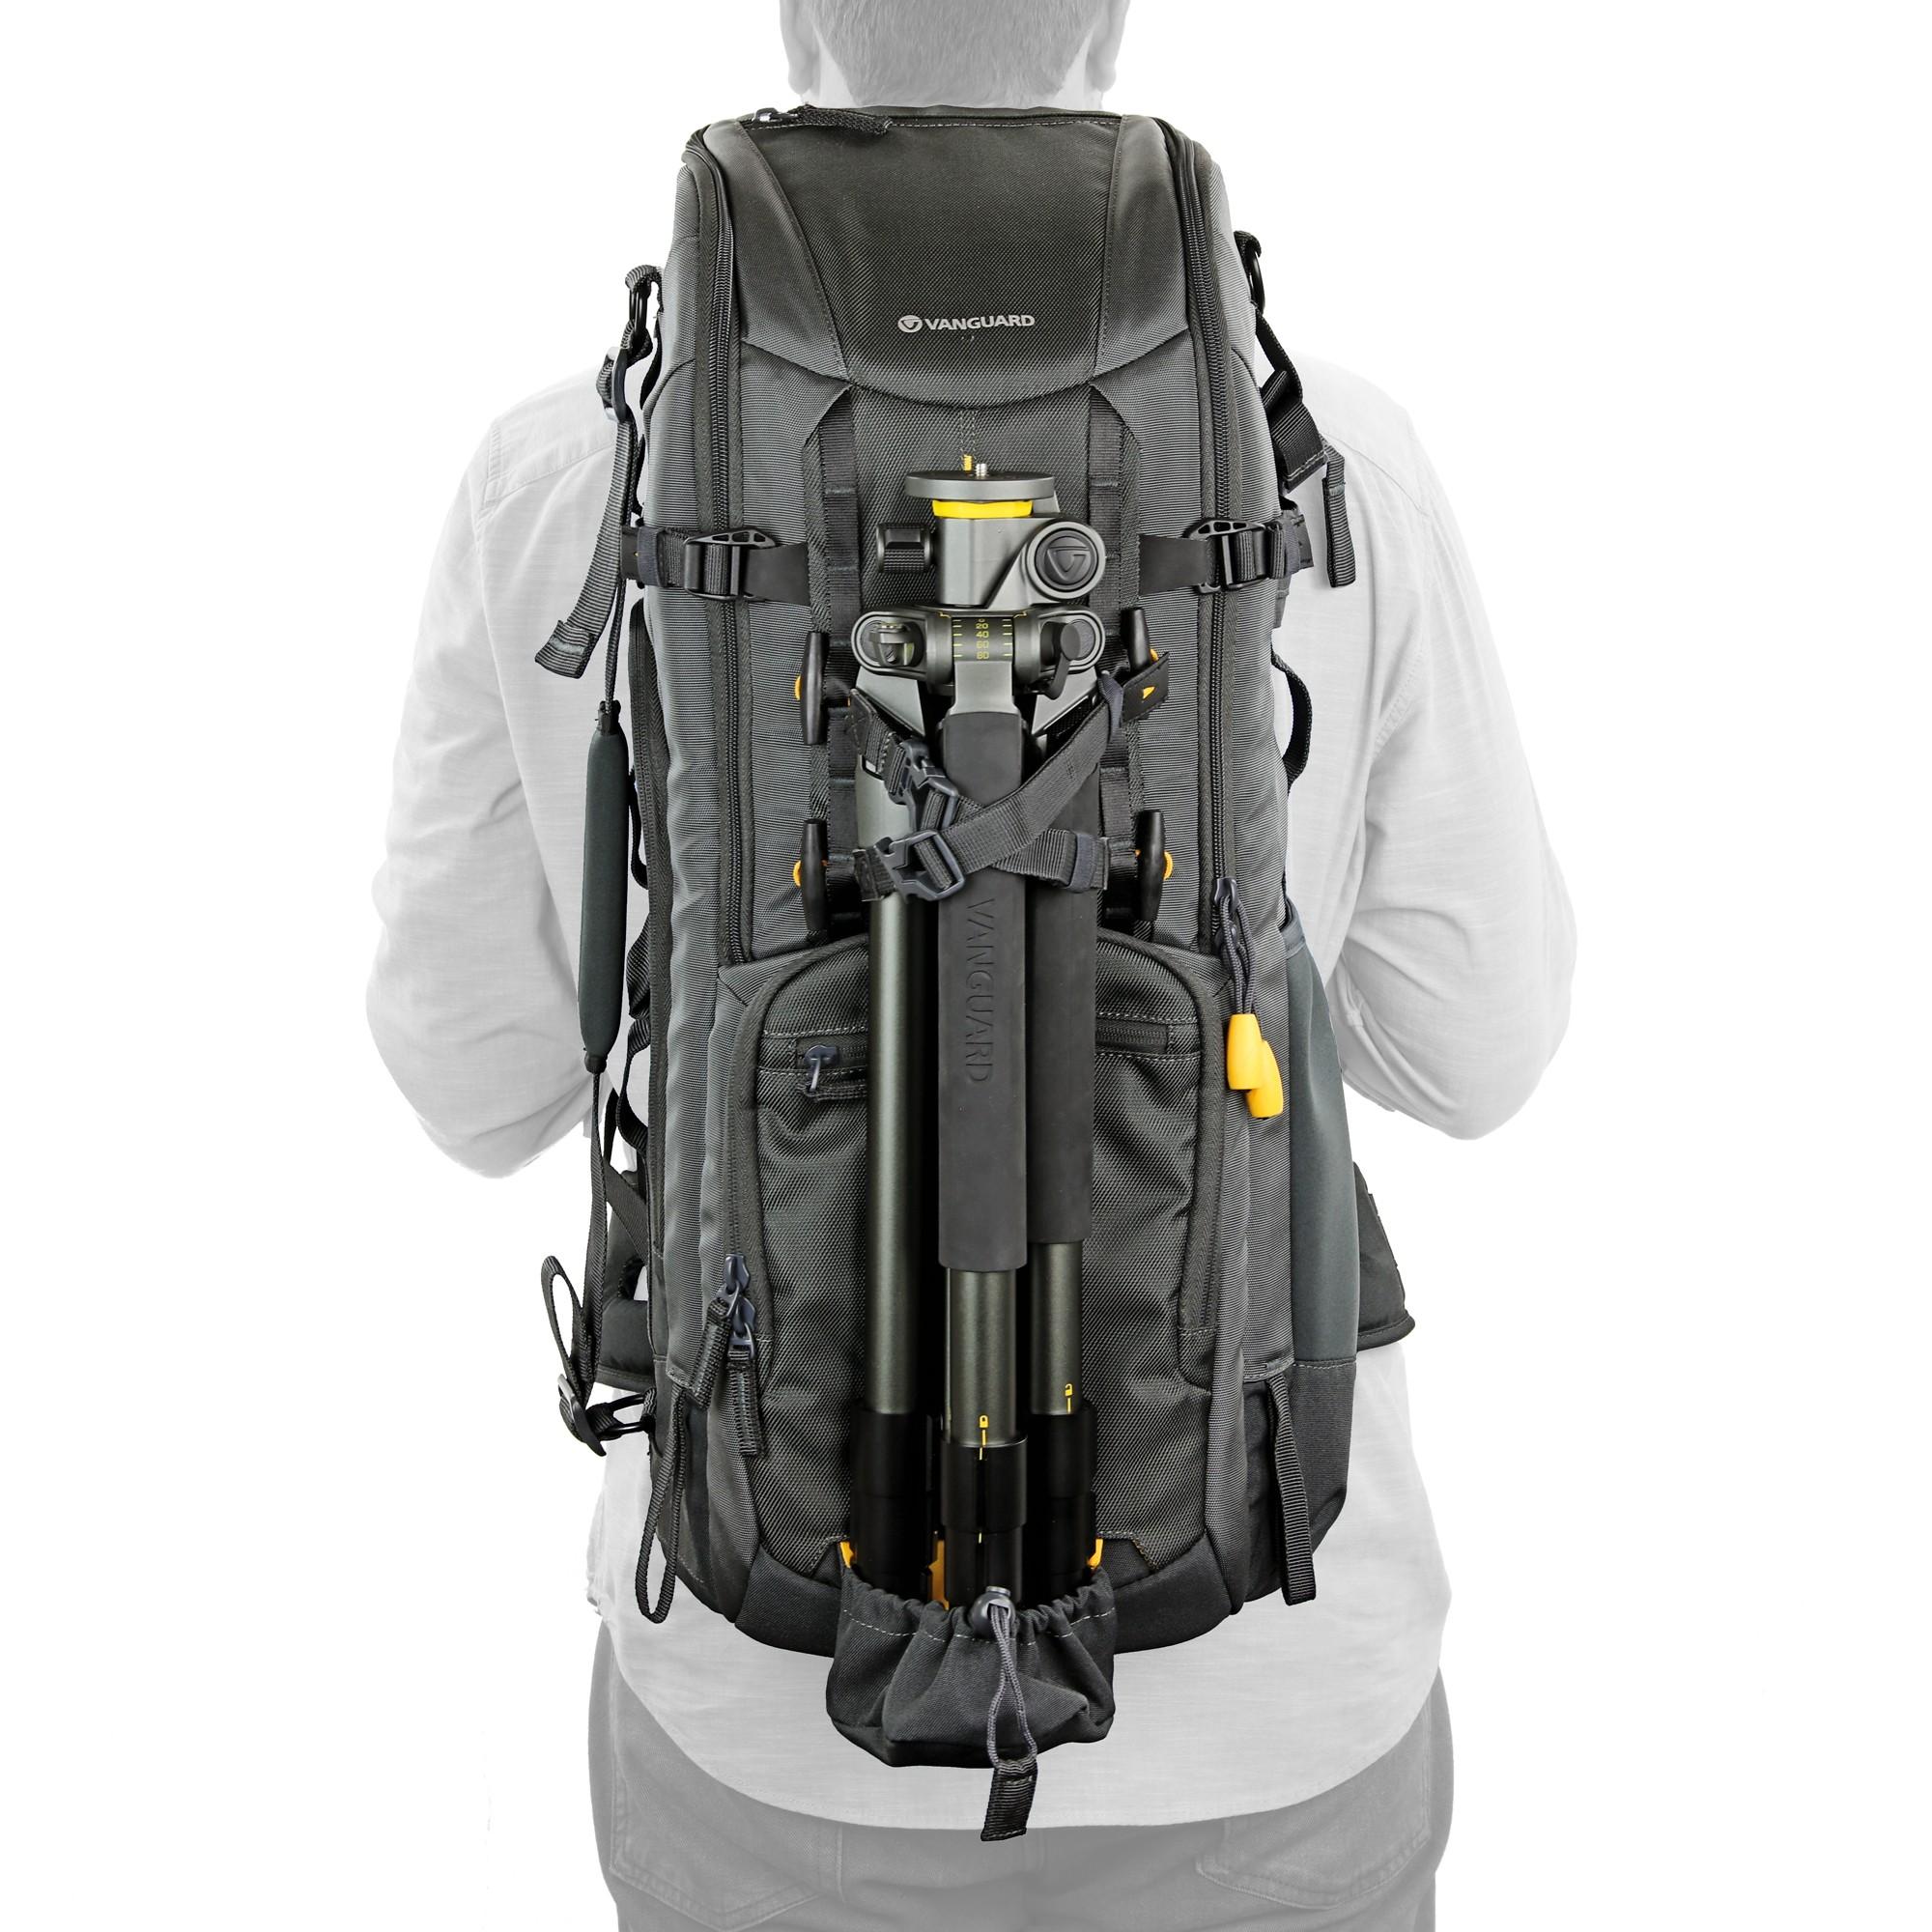 vanguard alta sky 66 photo backpack image